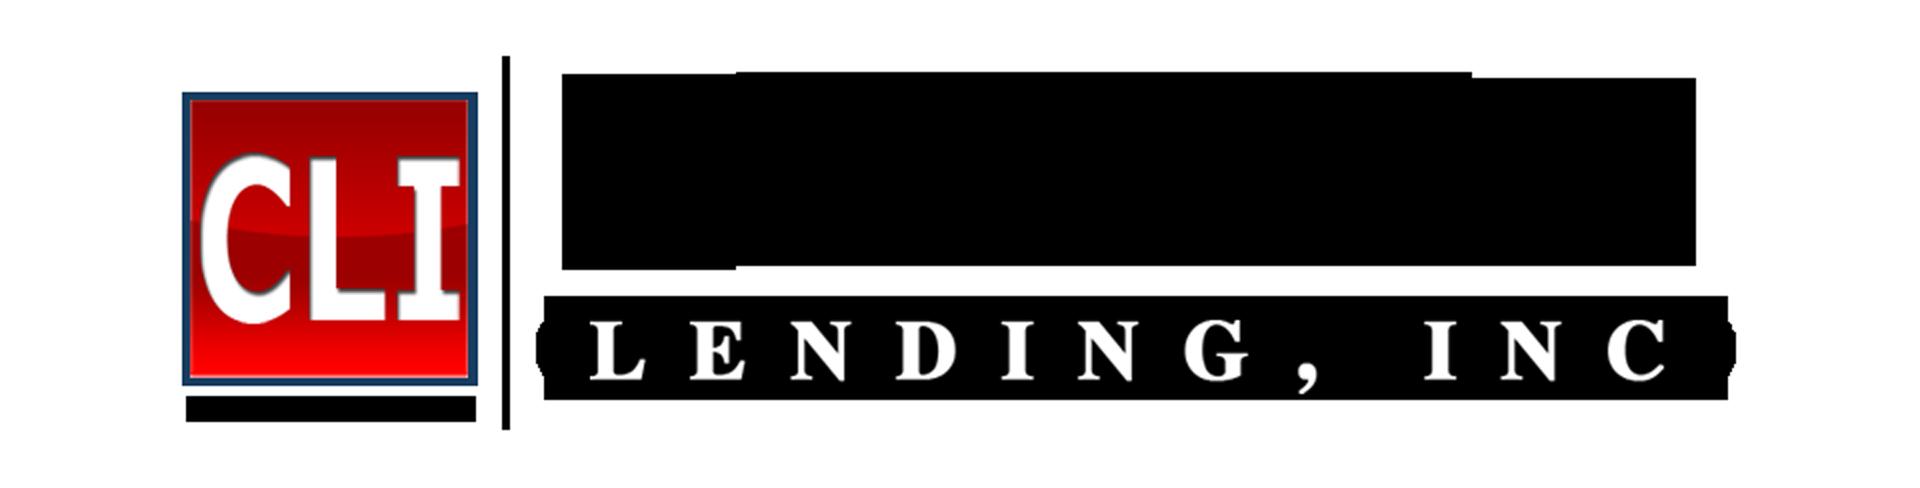 Capital Lending, Inc.